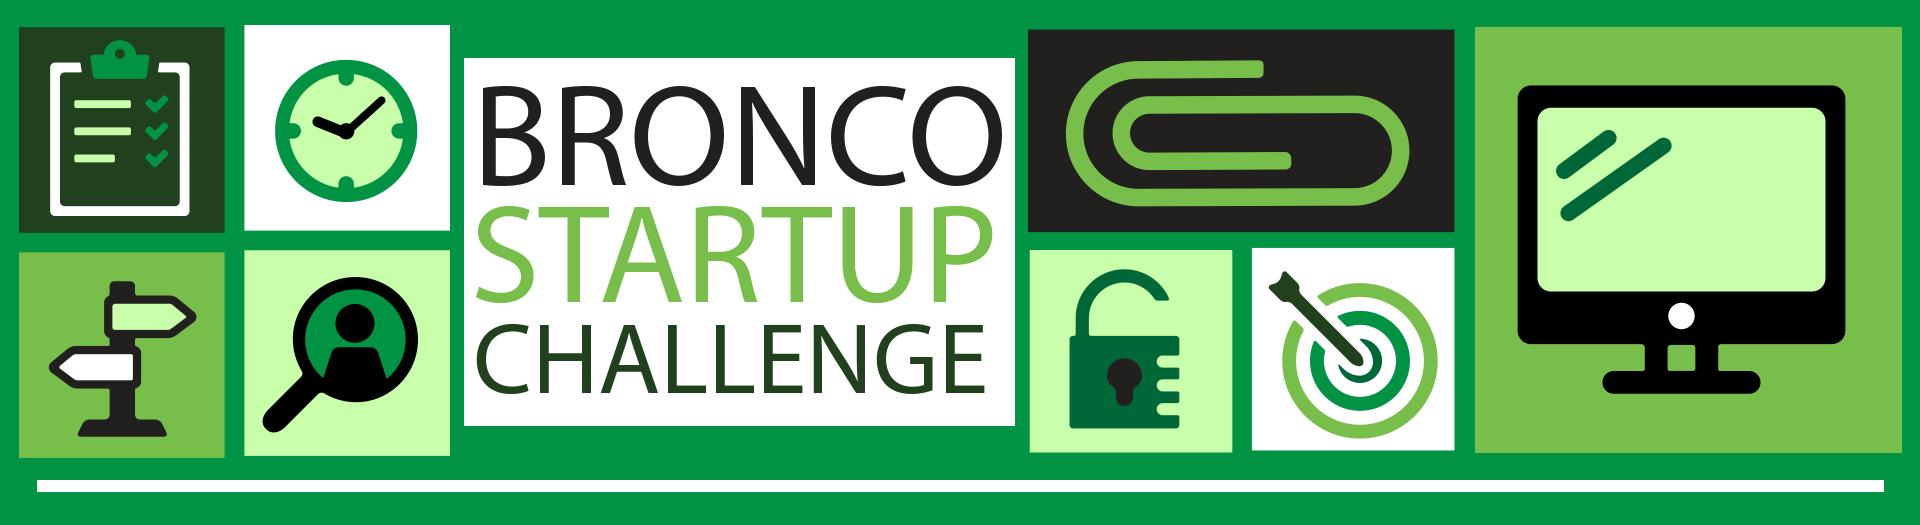 Bronco Startup Challenge